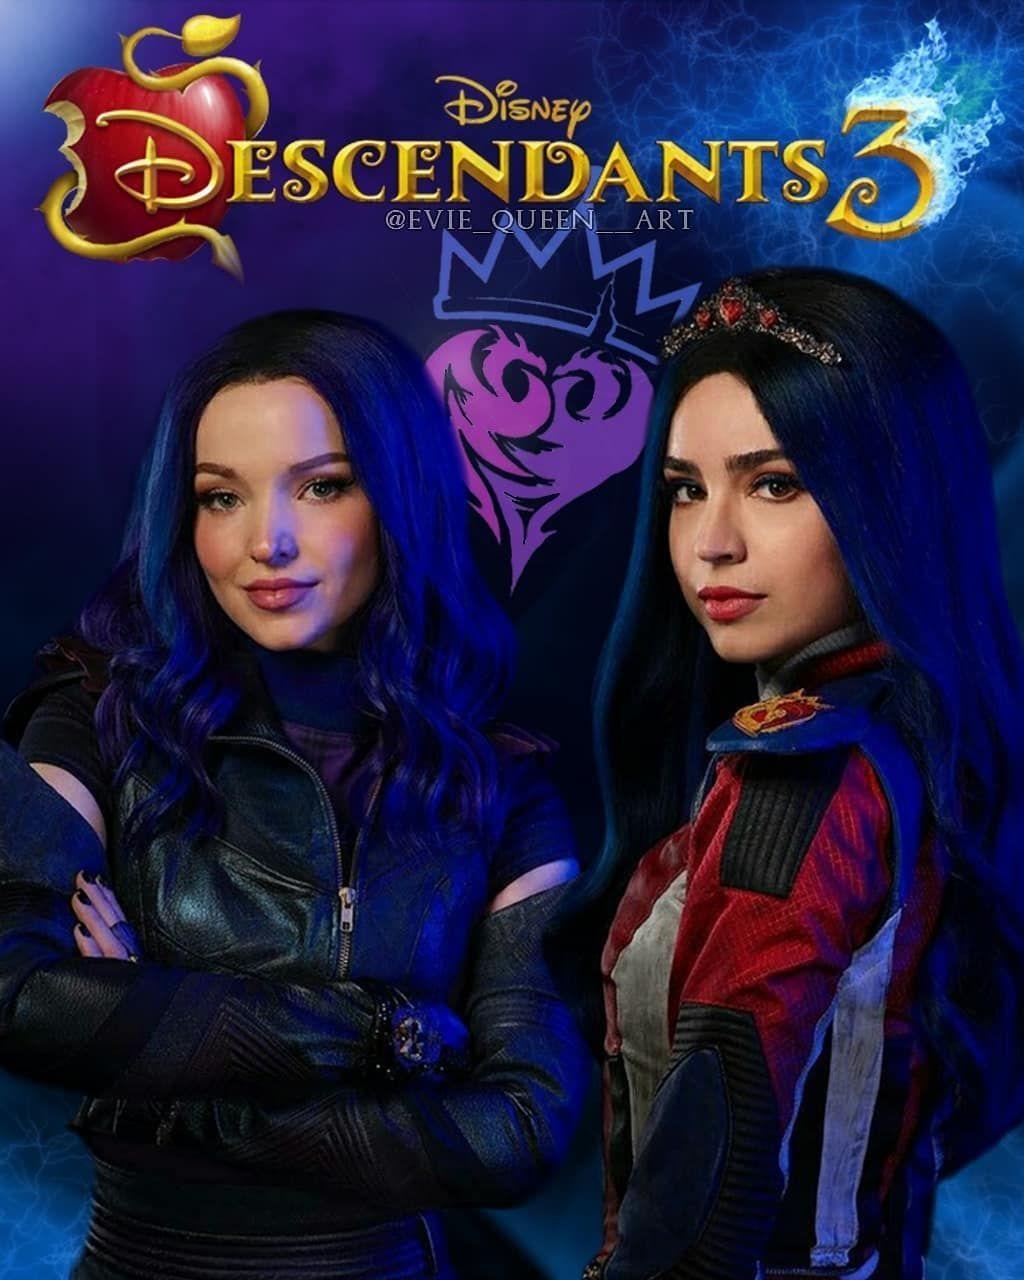 On Instagram Mevie Poster To Descendants 3 Credit If You Use Dovecameron S En 2020 Descendientes Actores Fotos De Sofia Carson Descendientes